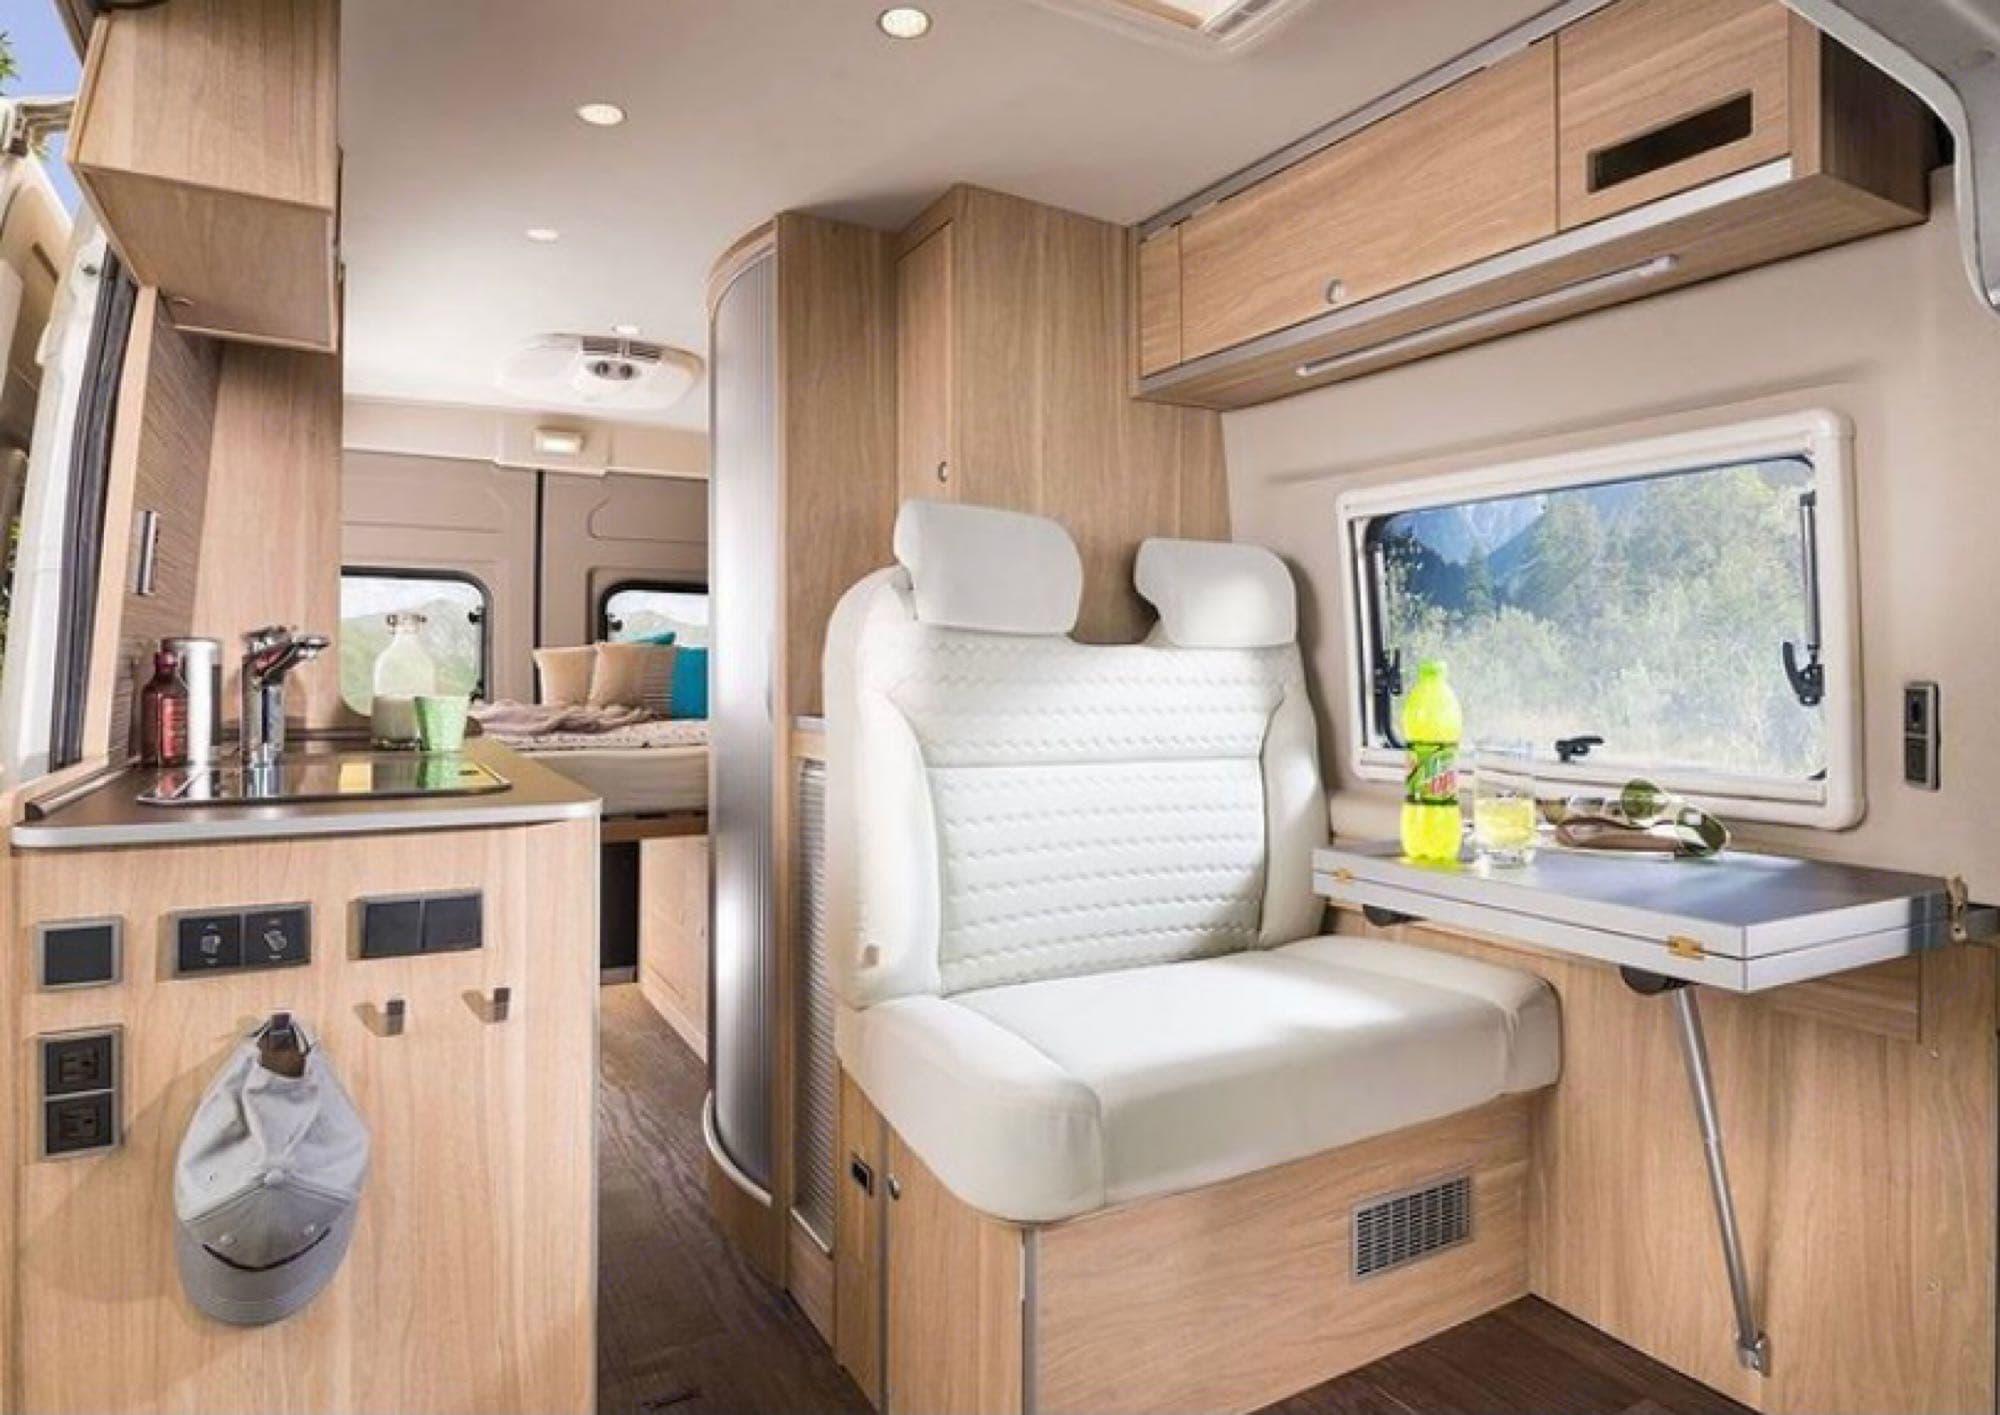 Fold Out Dining Table & Kitchen View. Hymer Aktiv Loft 2.0 2019